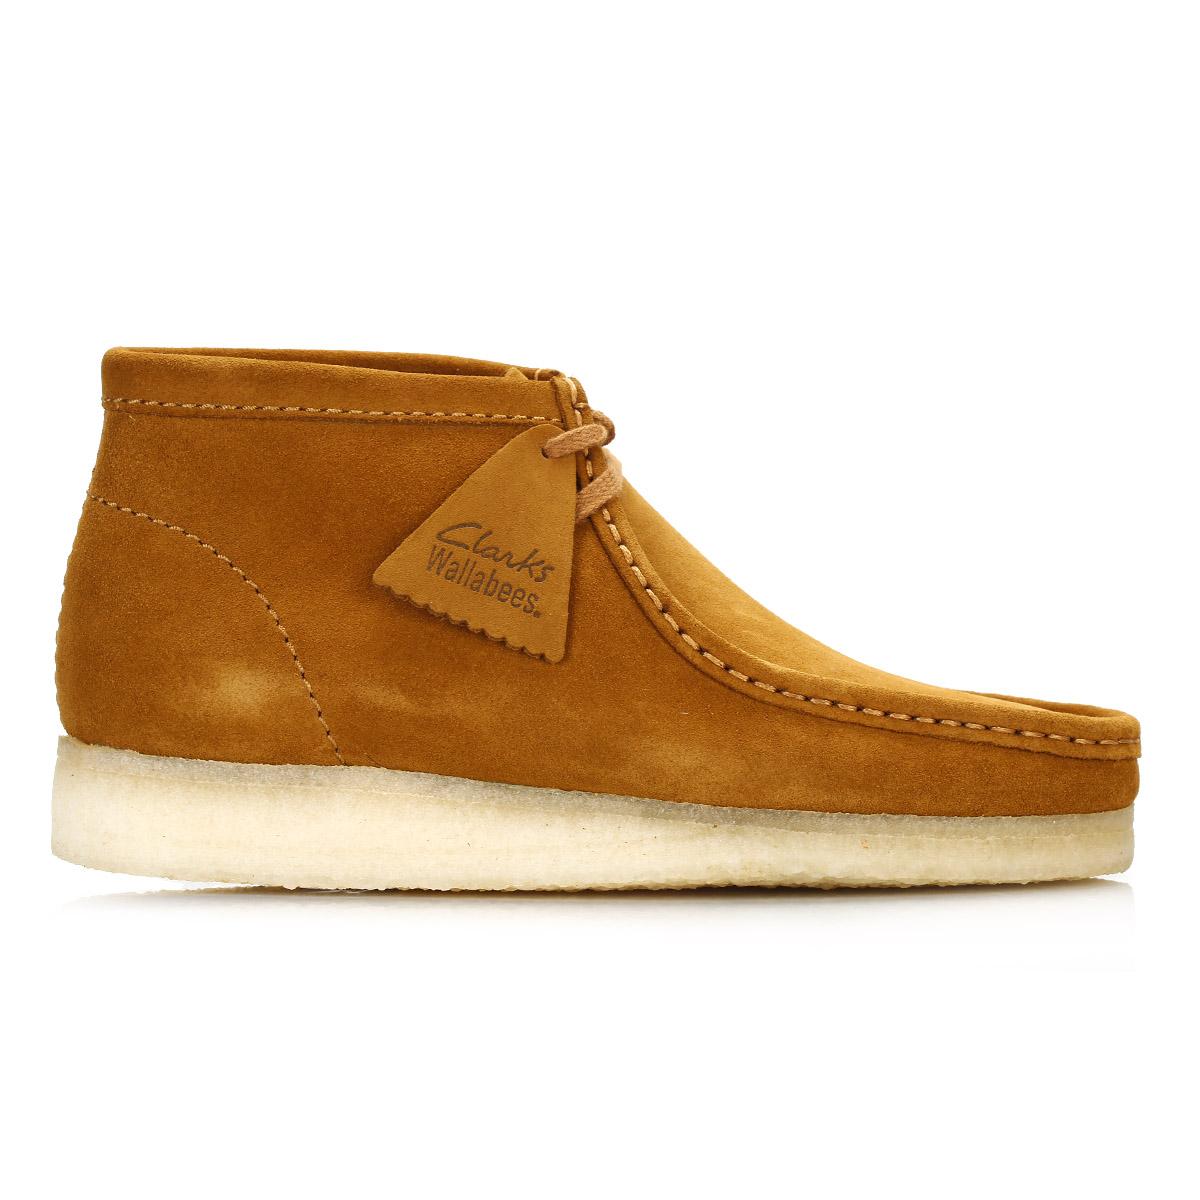 Clarks Shoes Ebay Mens